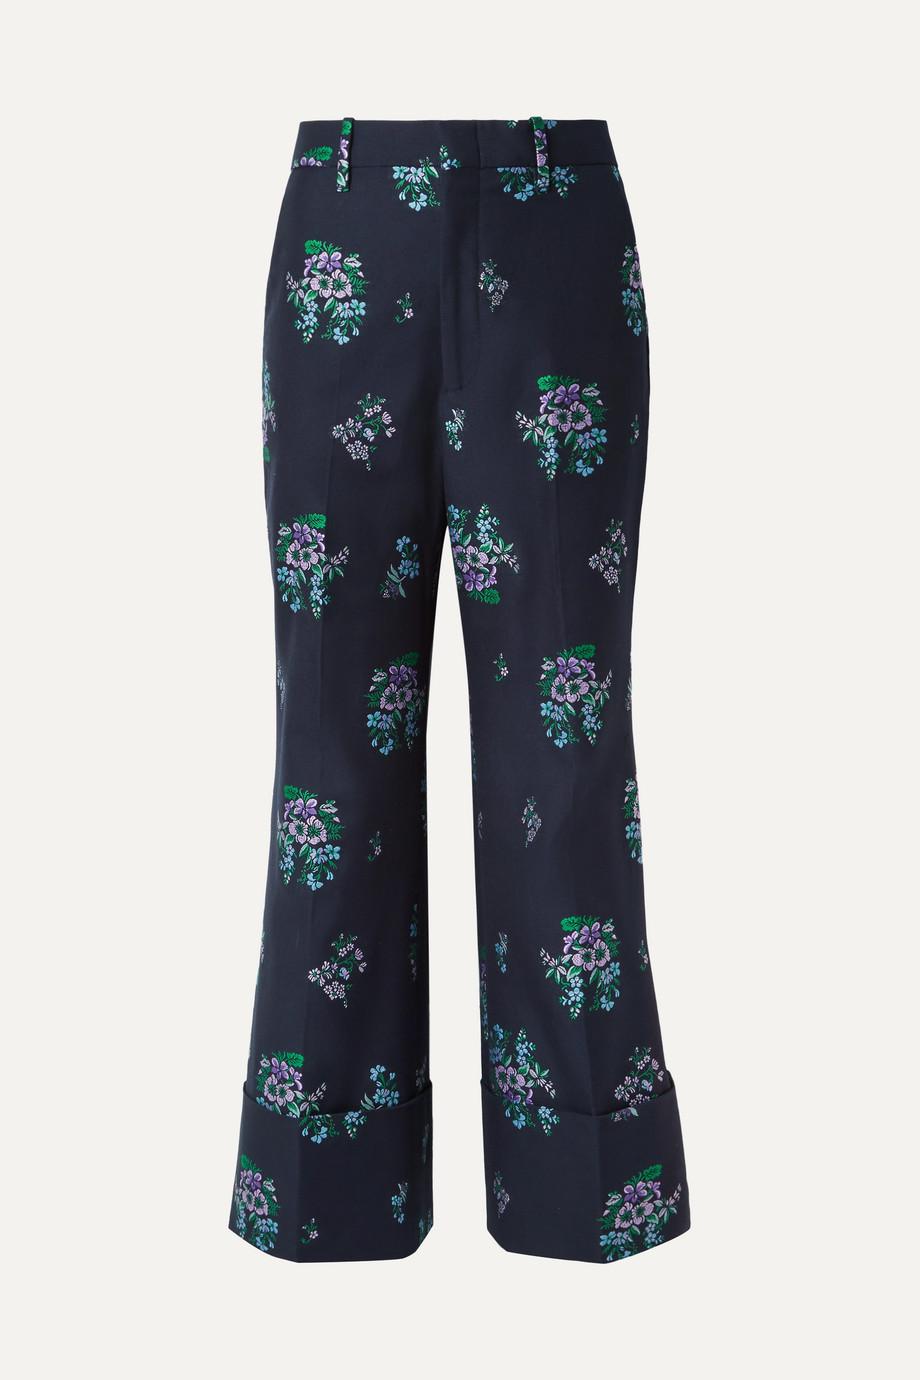 Gucci Cotton and wool-blend jacquard wide-leg pants